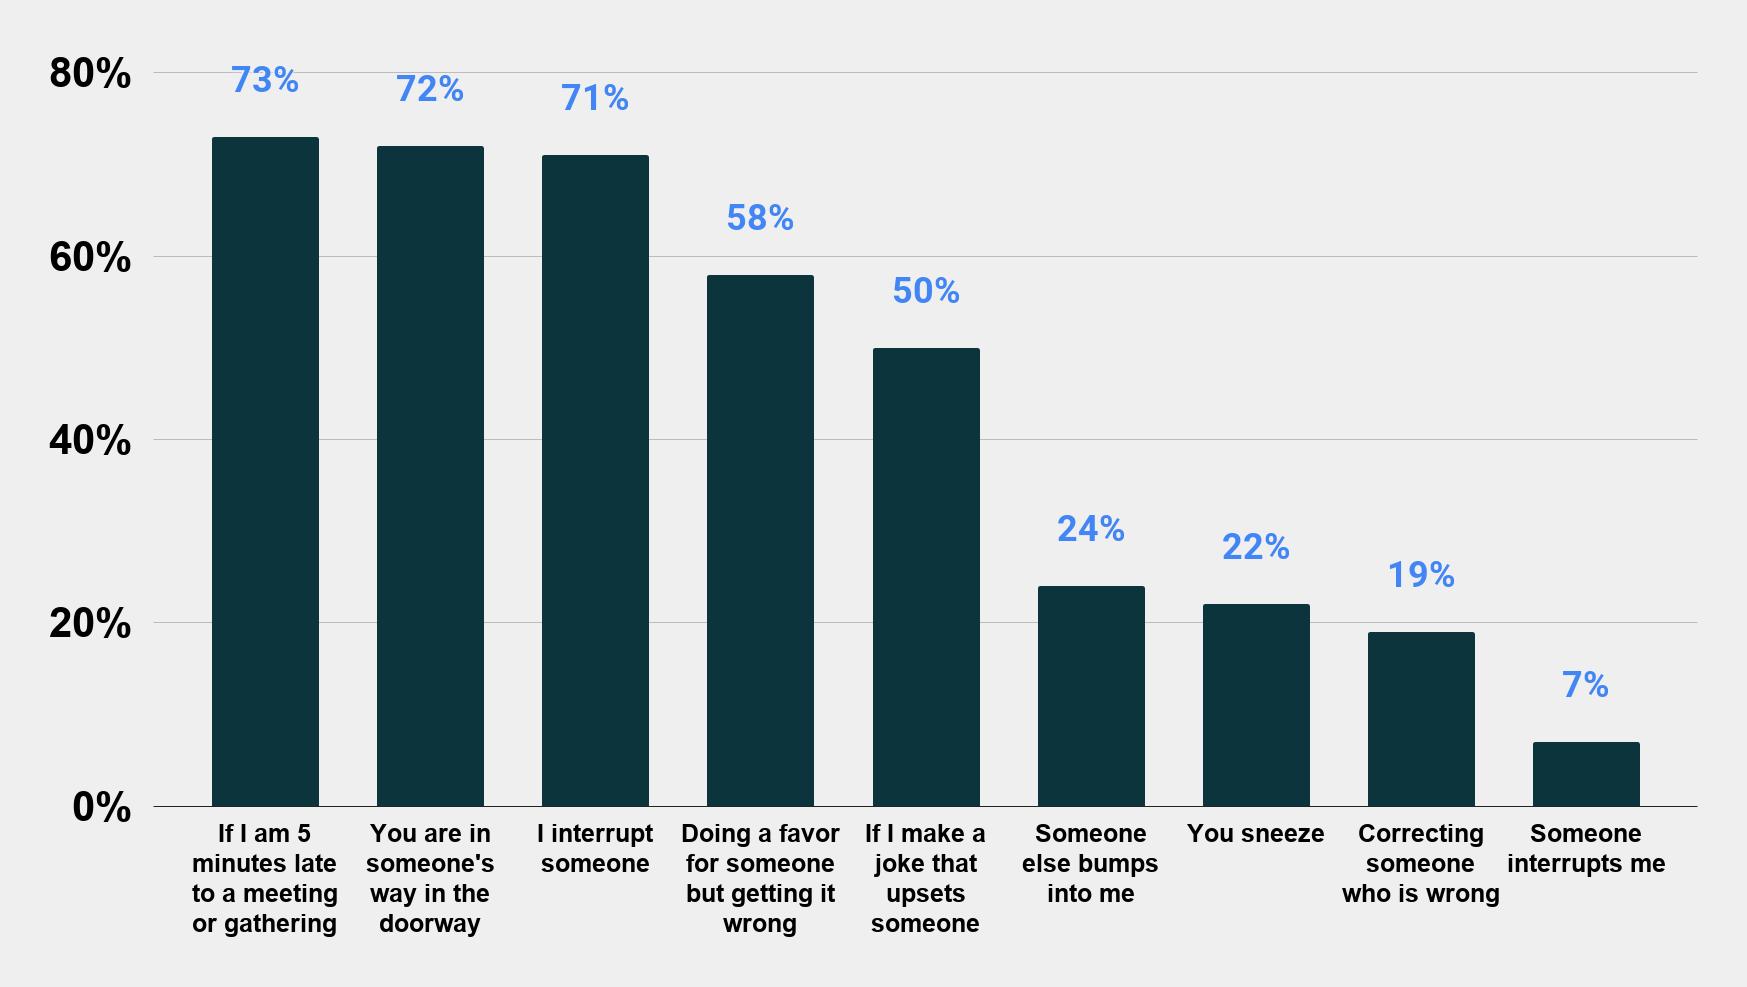 Things that make Americans say sorry (July 2015) Charts Graphs Stats